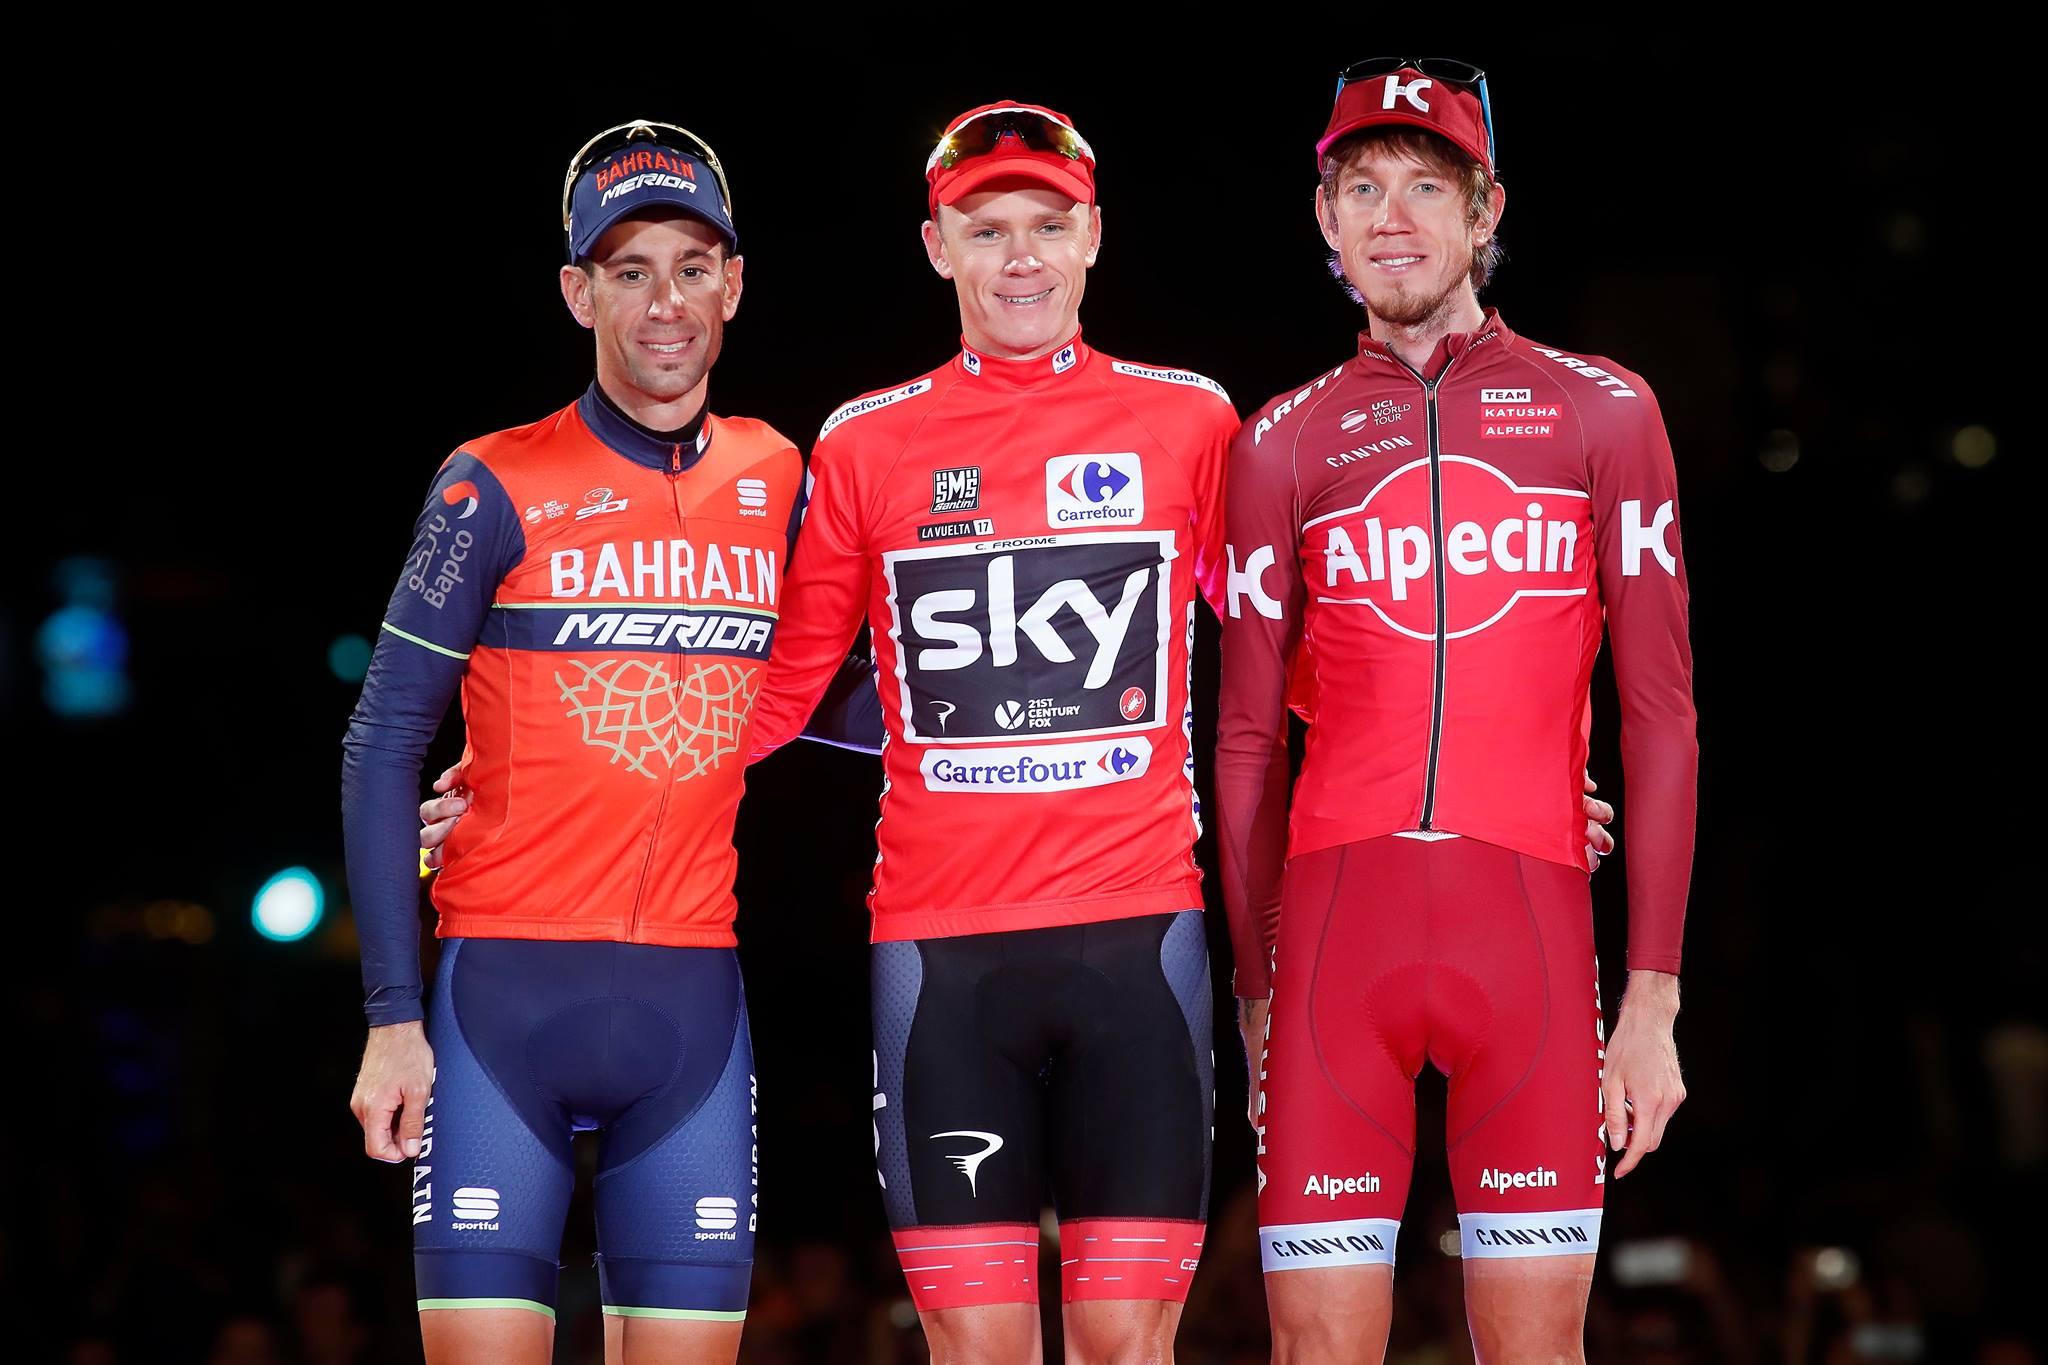 Podio de la Vuelta a España con Froome, NIbali y Zakarin